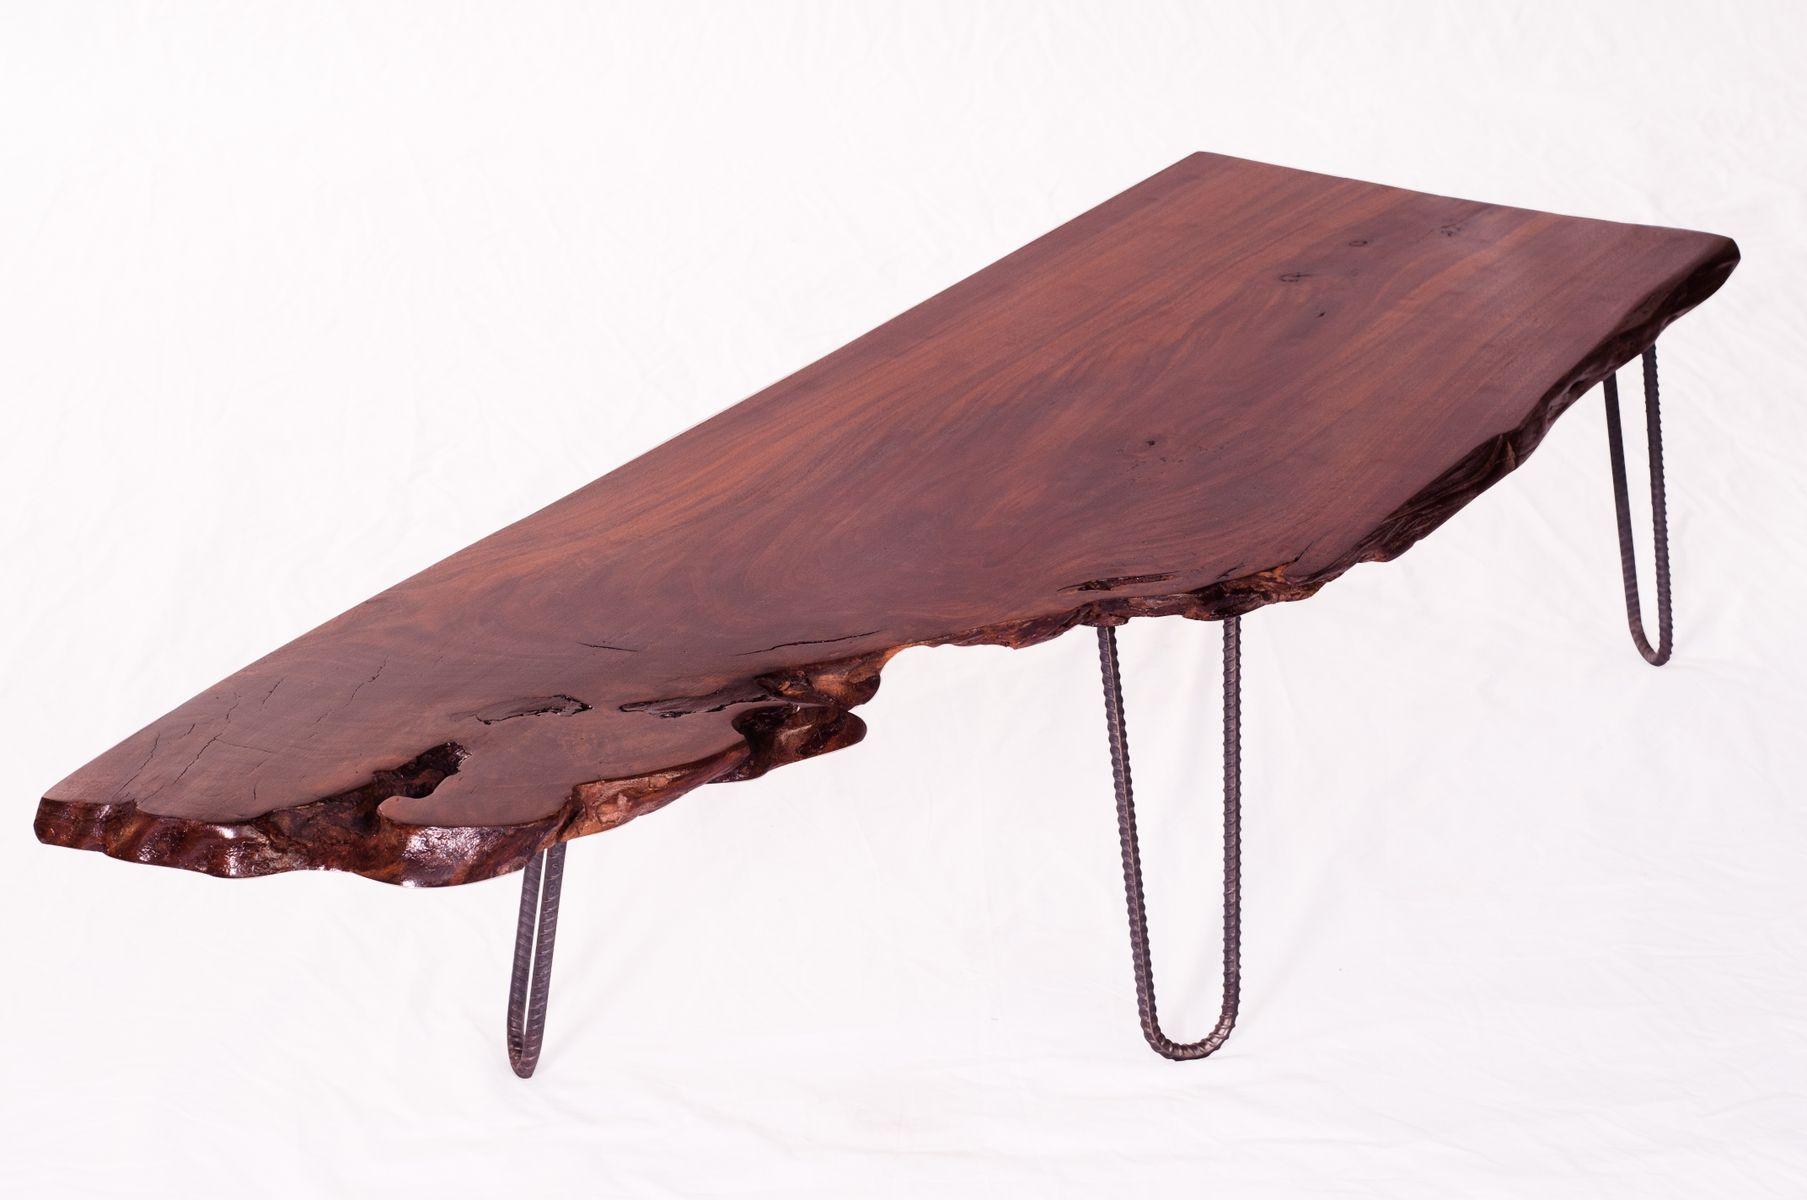 Custom Industrial Walnut Coffee Table Natural Edges Rebar Legs by